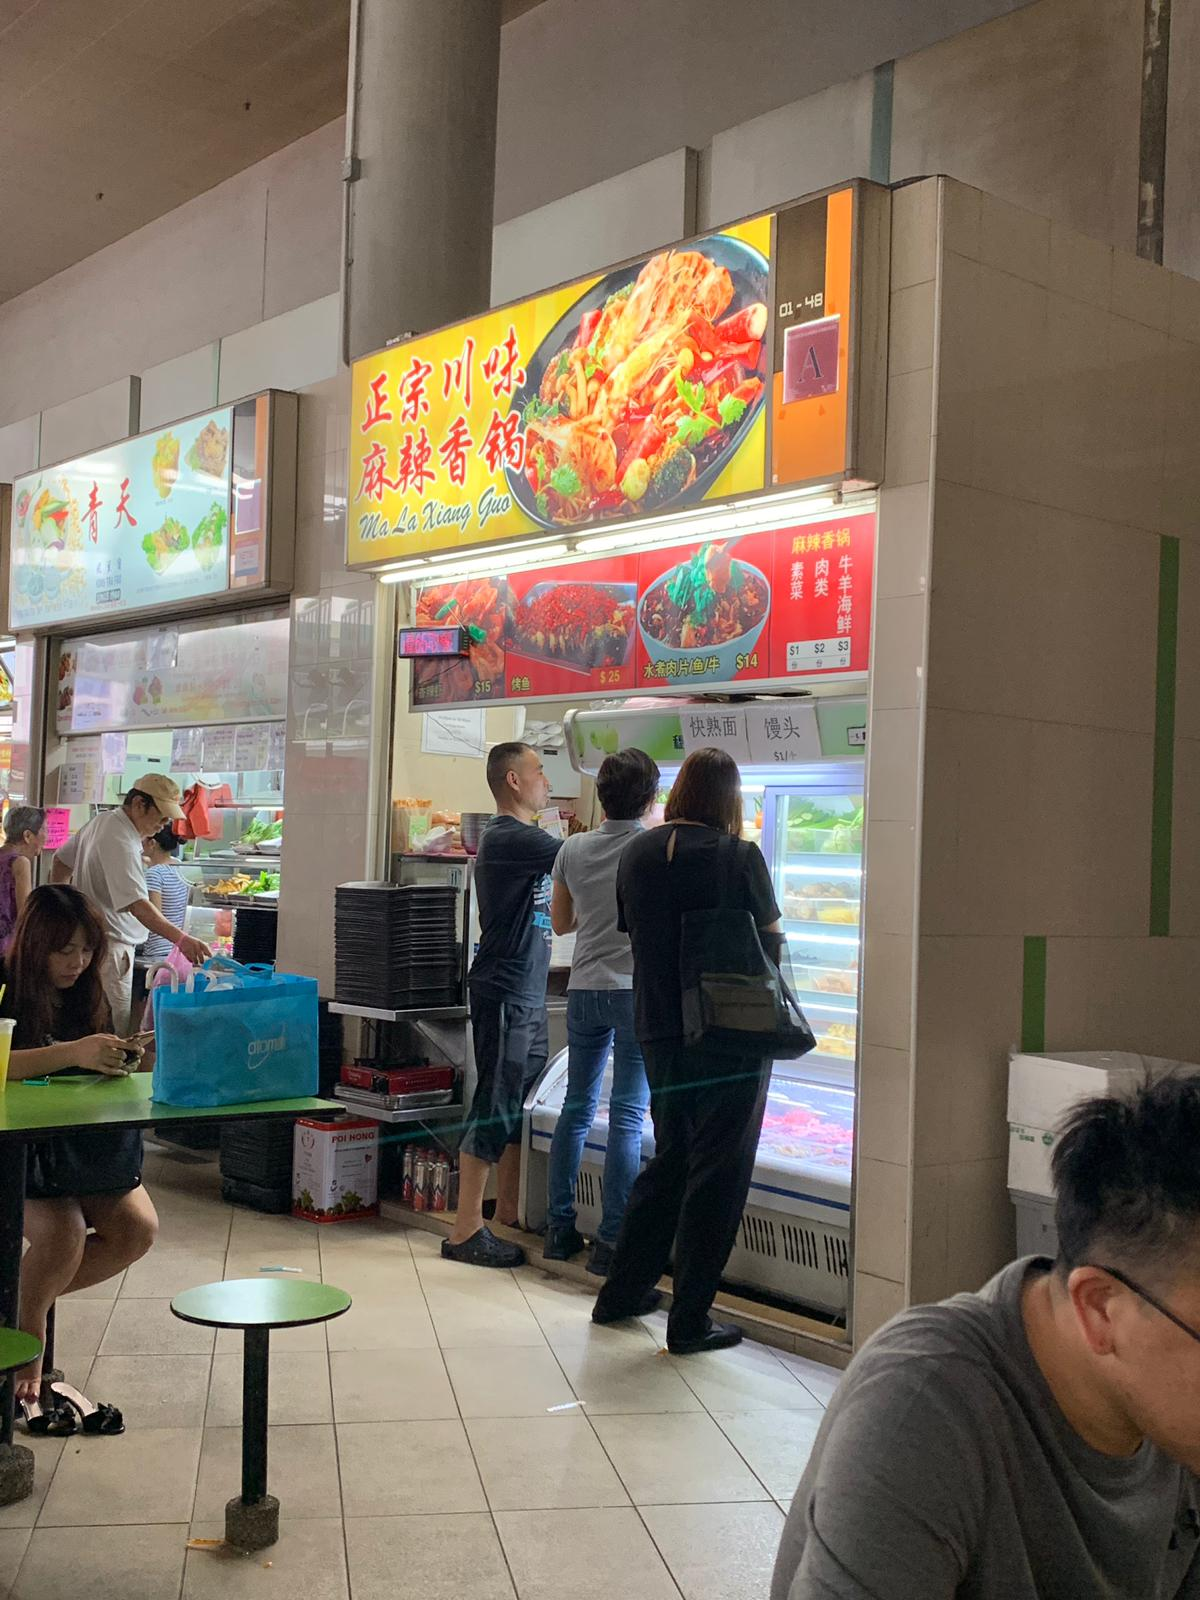 Mala stall at Bedok Interchange Hawker Centre